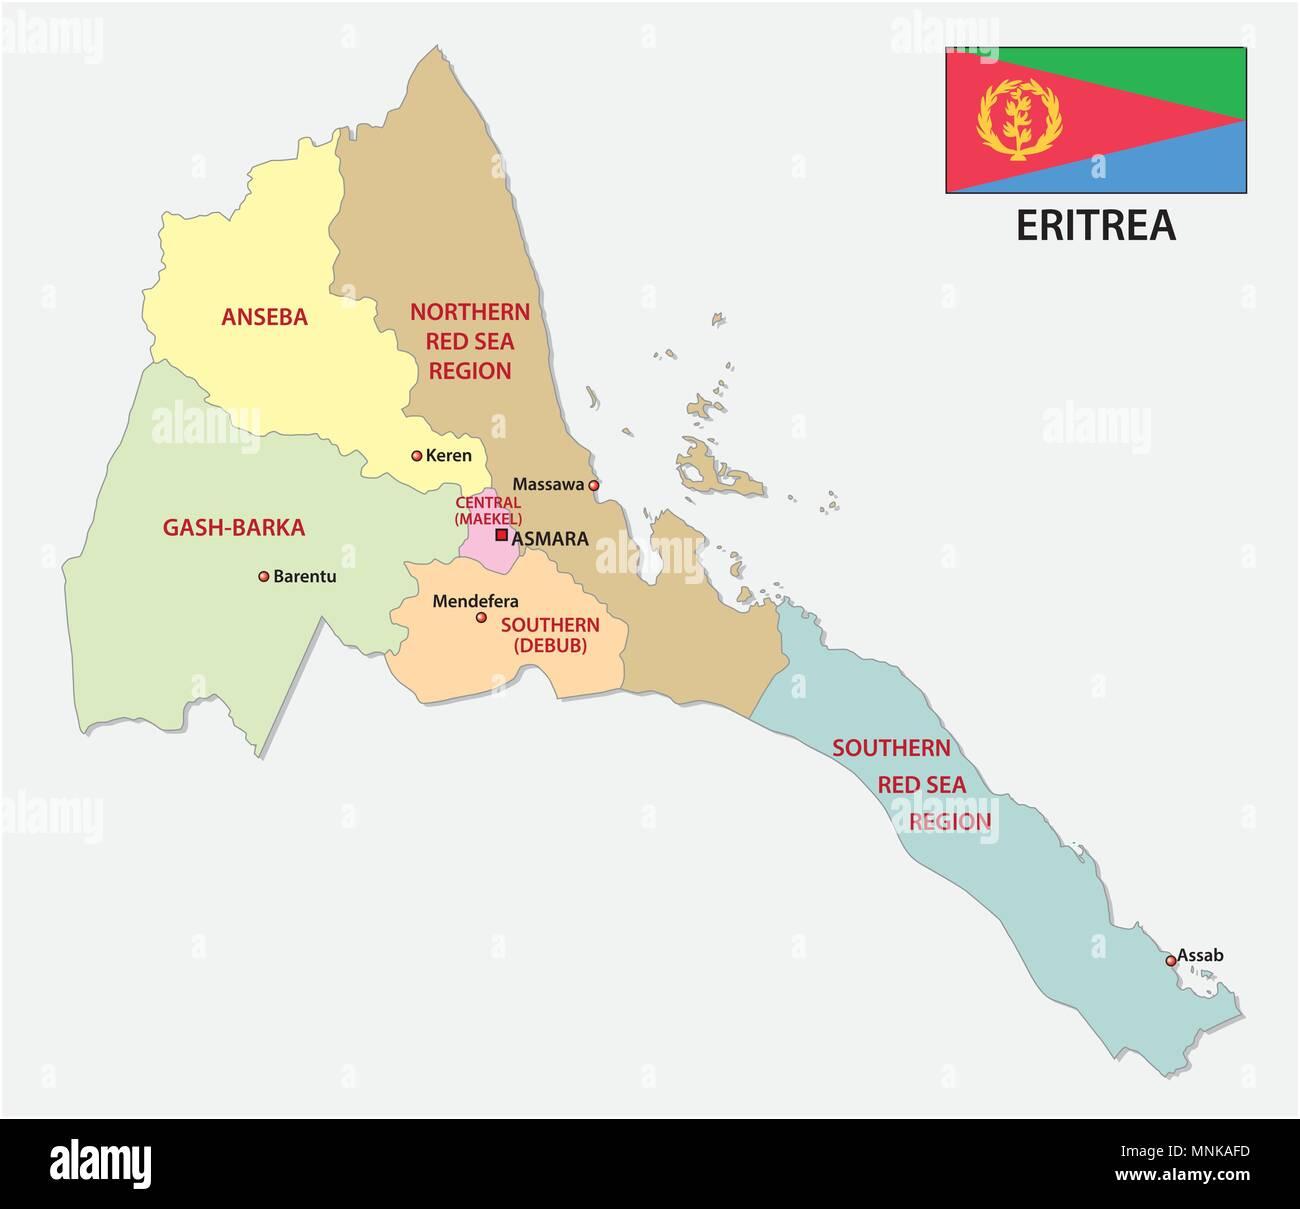 Cartina Eritrea.Eritrea Administrative And Political Vector Map With Flag Stock Vector Image Art Alamy